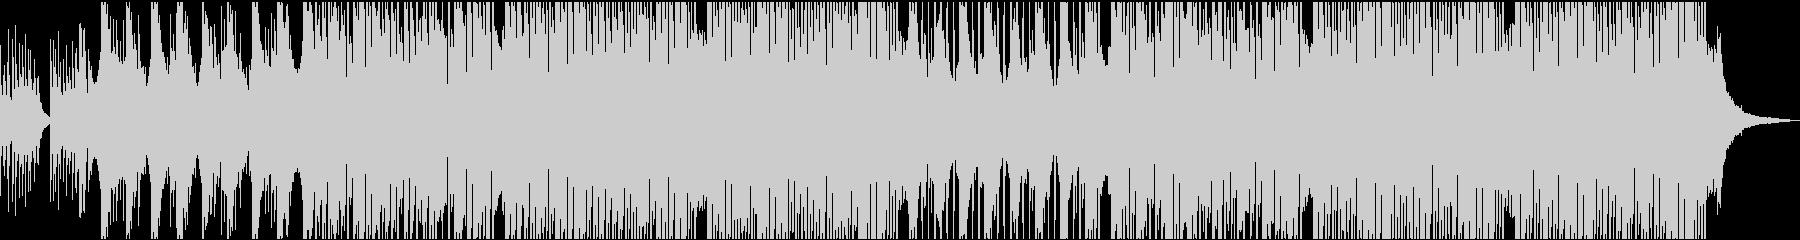 Acousticの未再生の波形